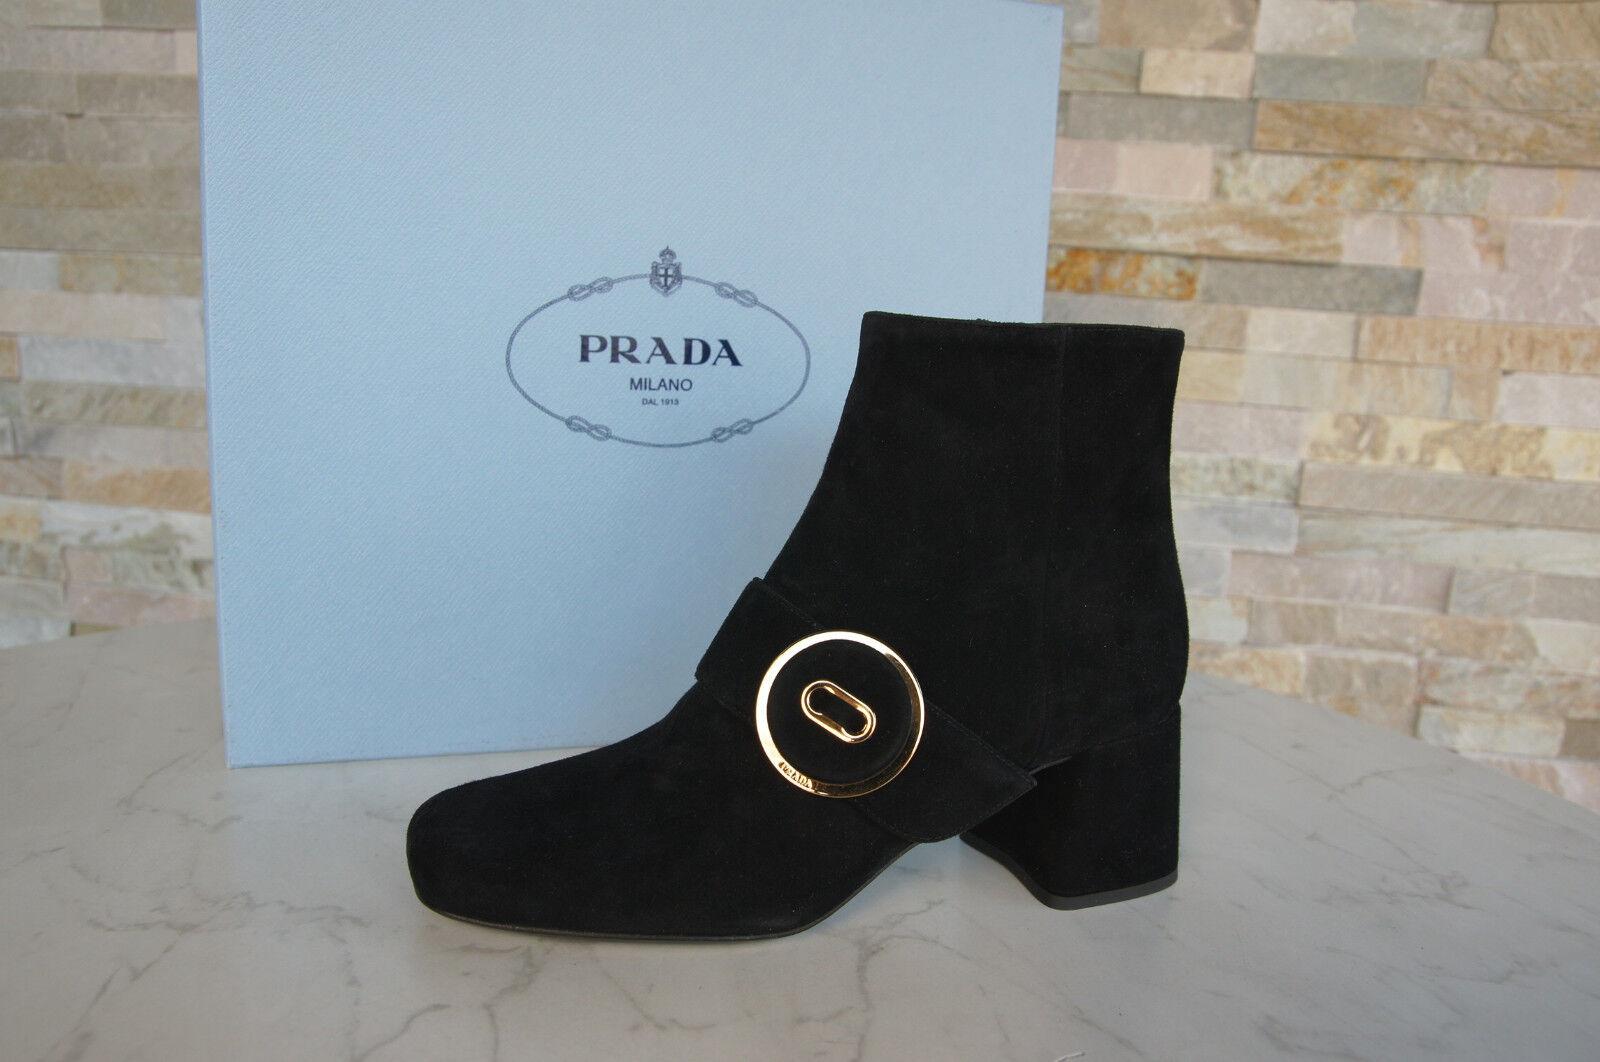 Prada Prada Prada 37 Bottines Bottes Chaussures 1T740H Noir Neuf Autrefois 05260f